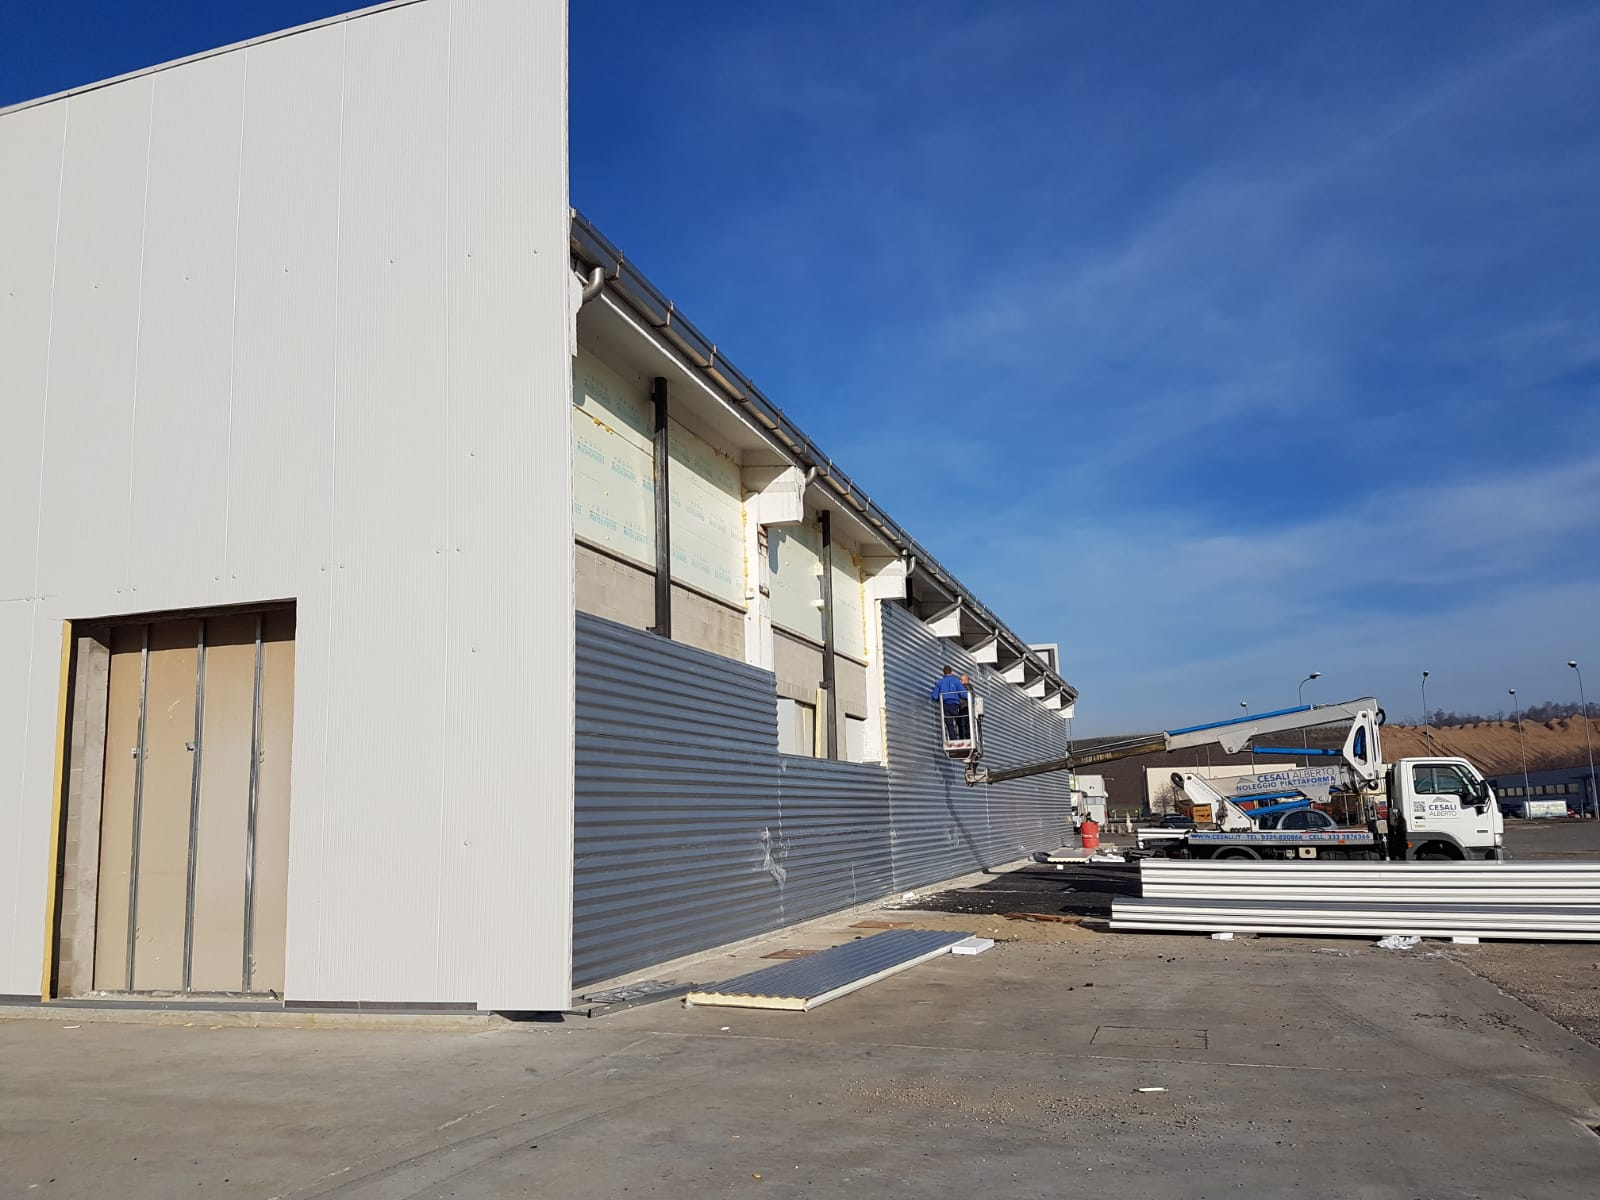 cesali_centro_commerciale_risparmio_casa_romagnano_sesia_isolpack_1